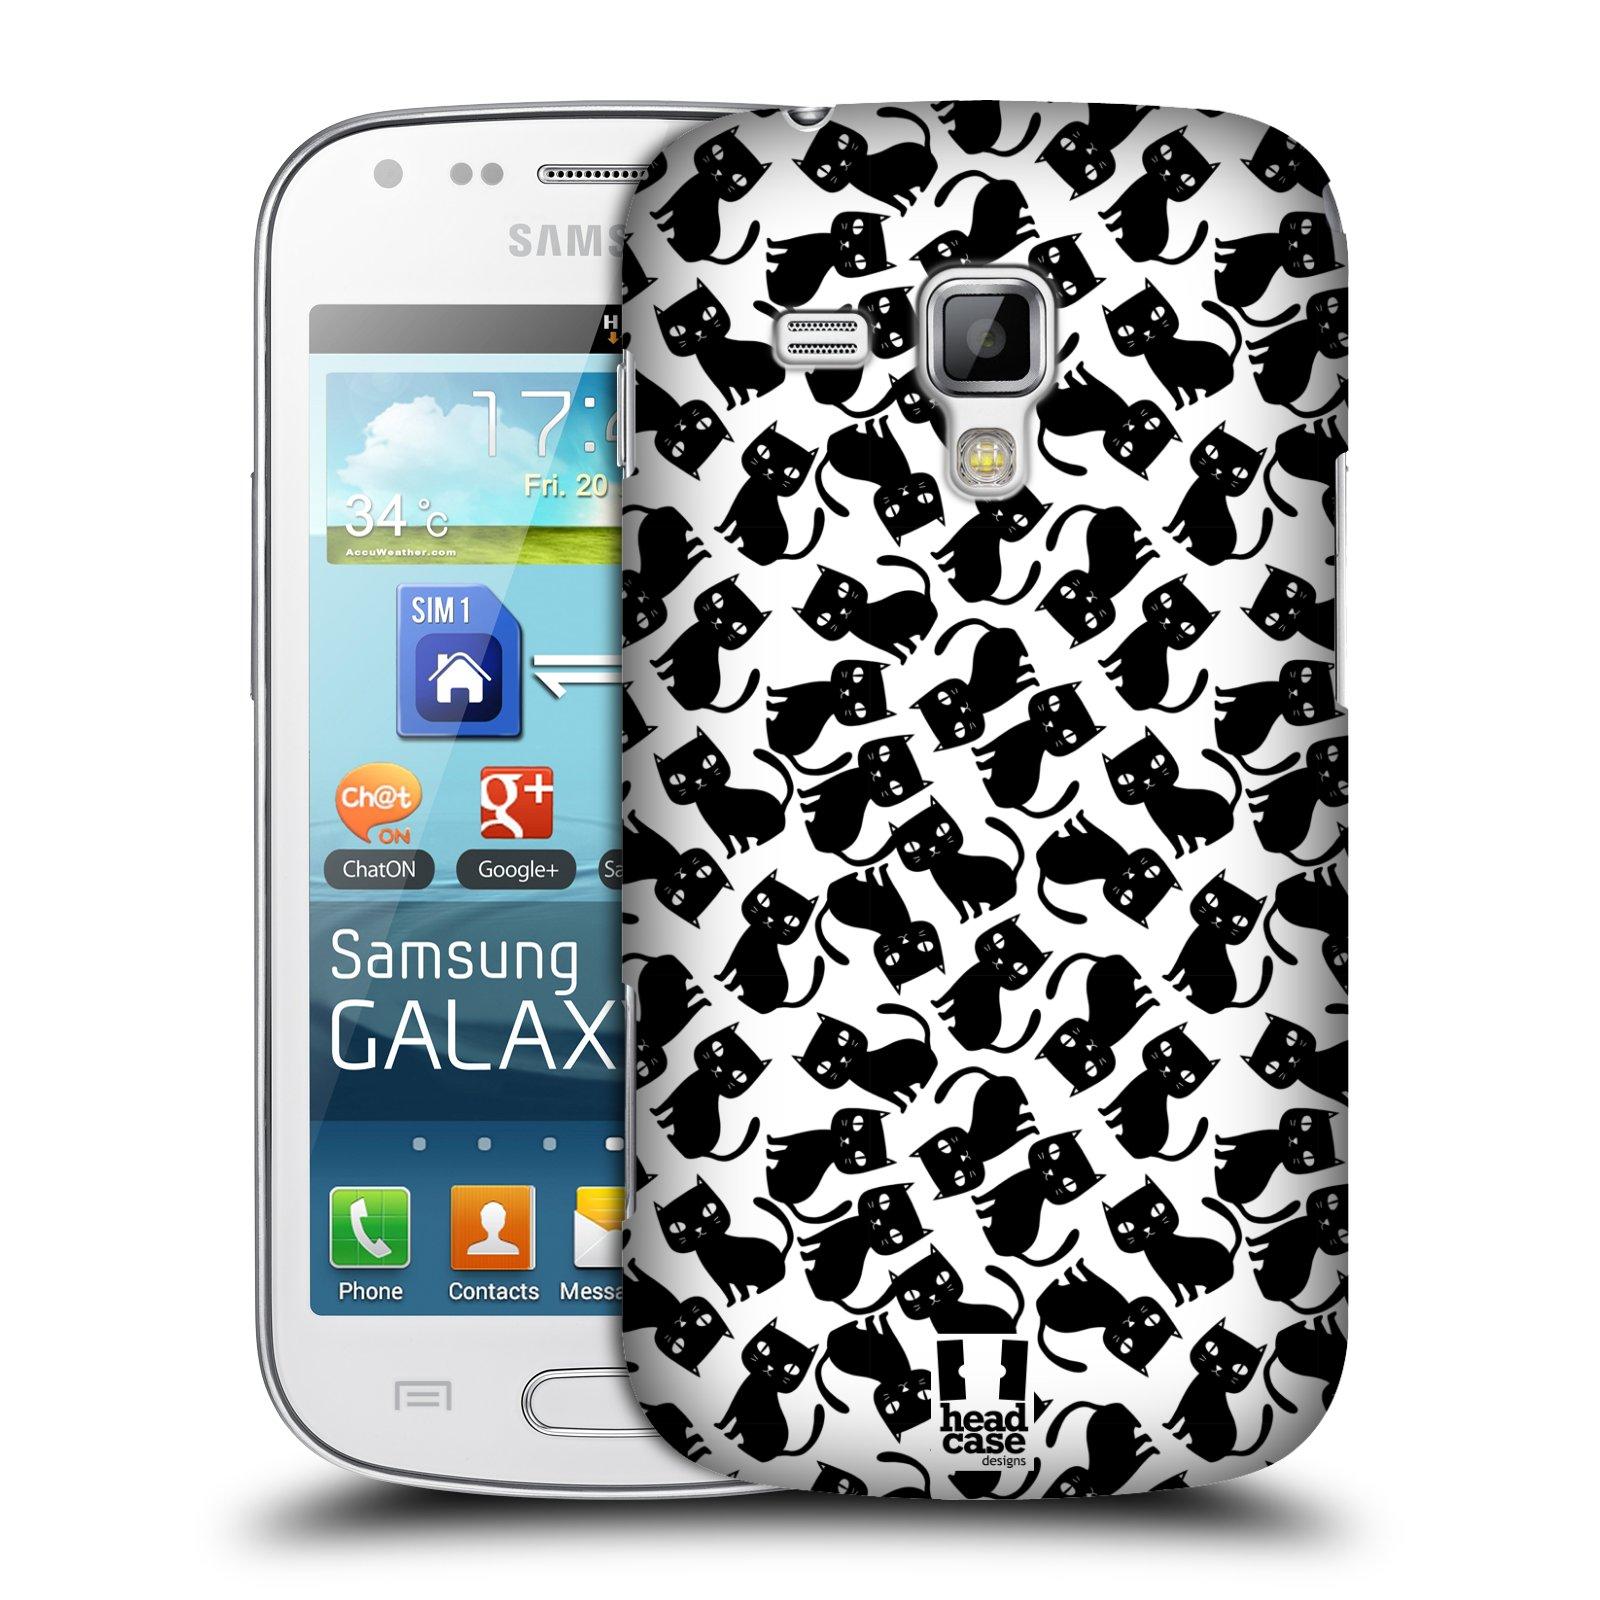 Plastové pouzdro na mobil Samsung Galaxy S Duos HEAD CASE KOČKY Black Pattern (Kryt či obal na mobilní telefon Samsung Galaxy S Duos GT-S7562)